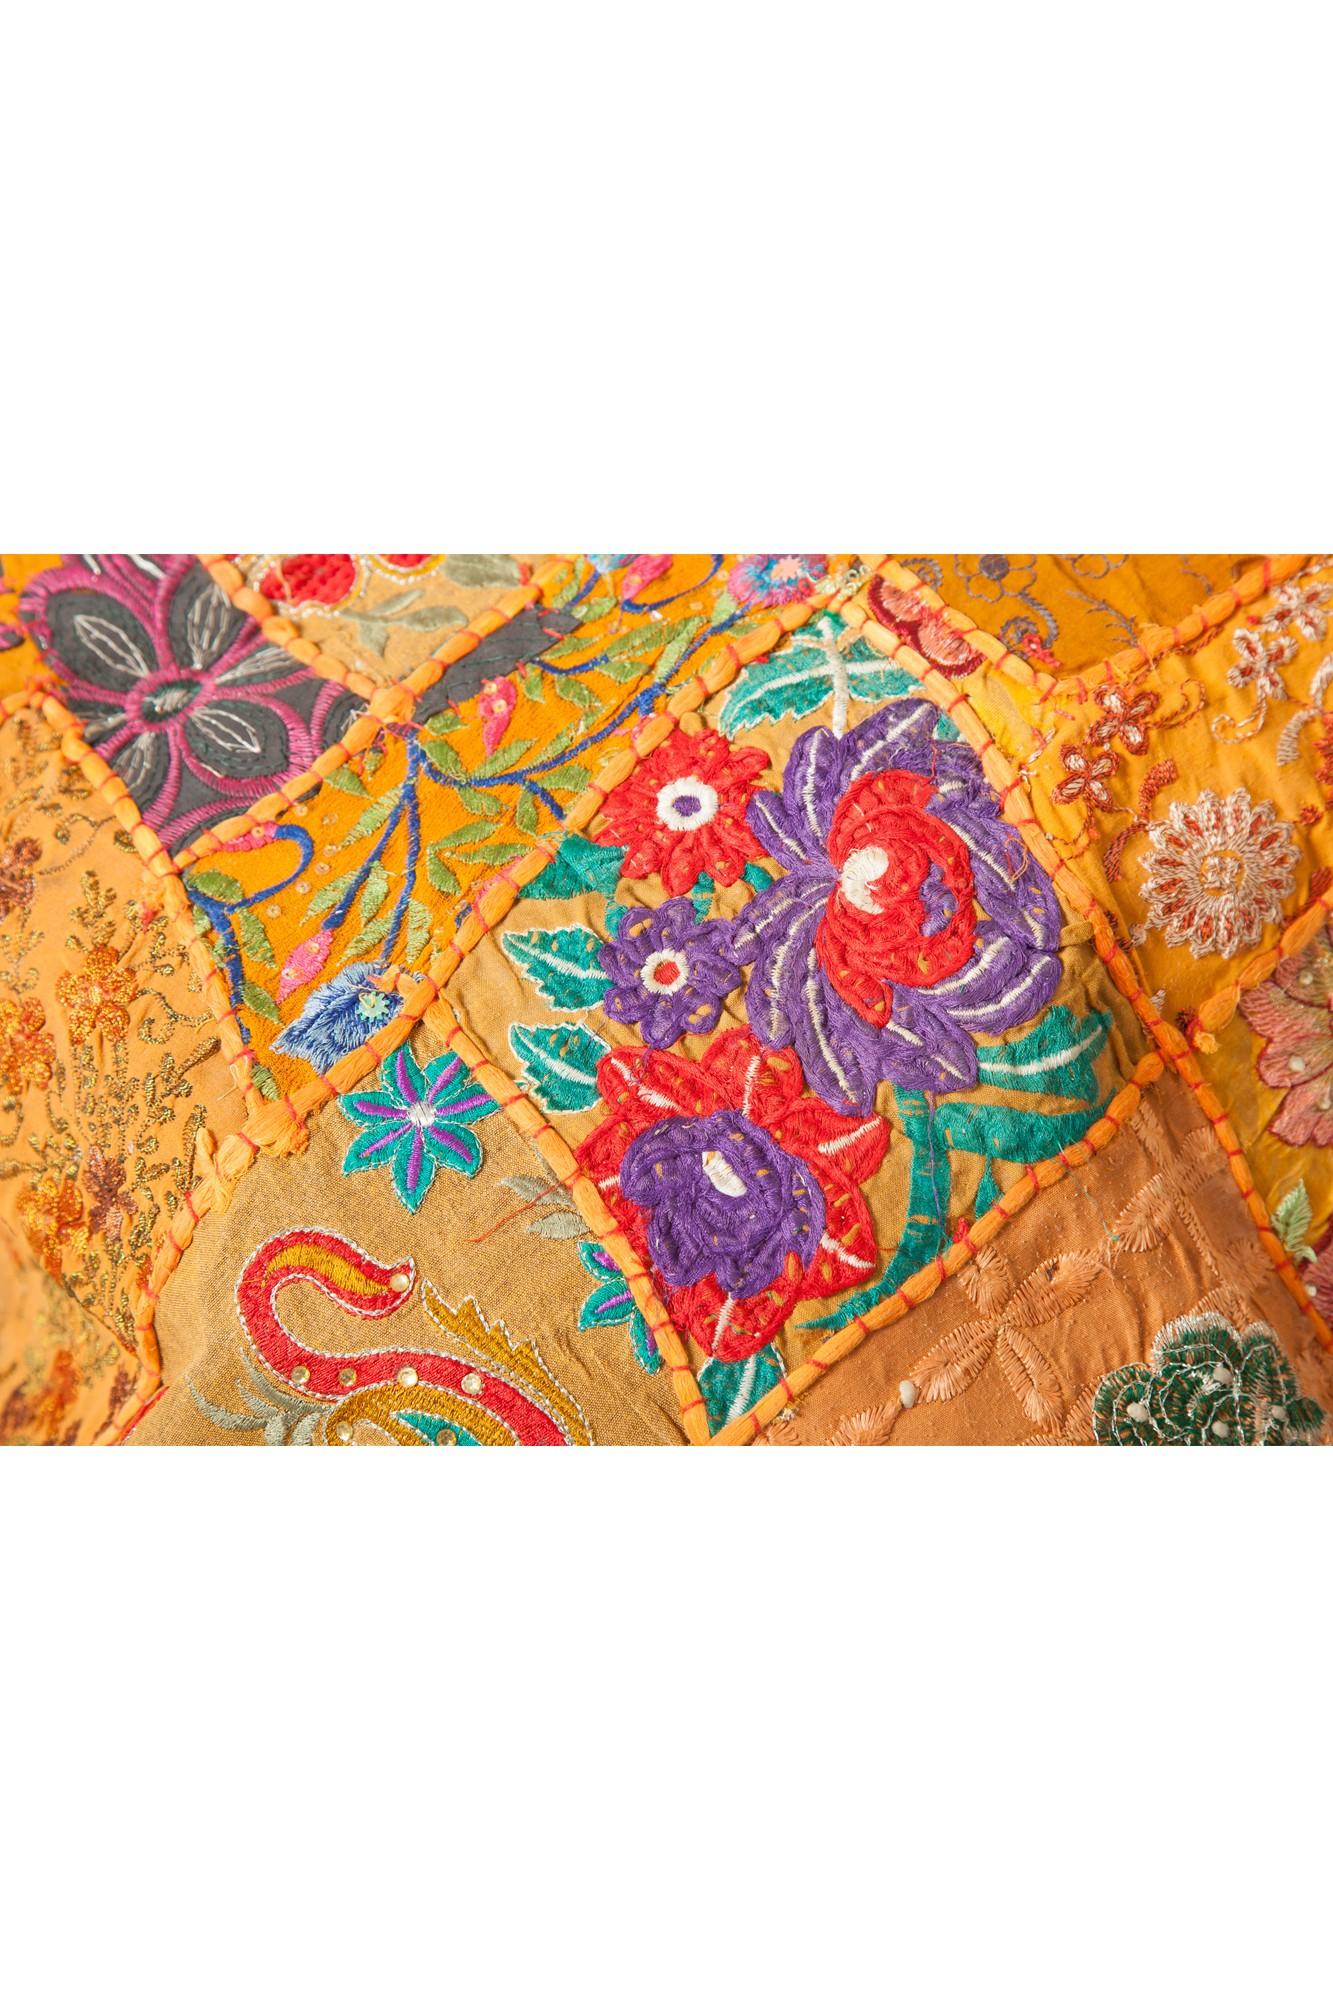 Cuvertura dubla caramizie din sariuri